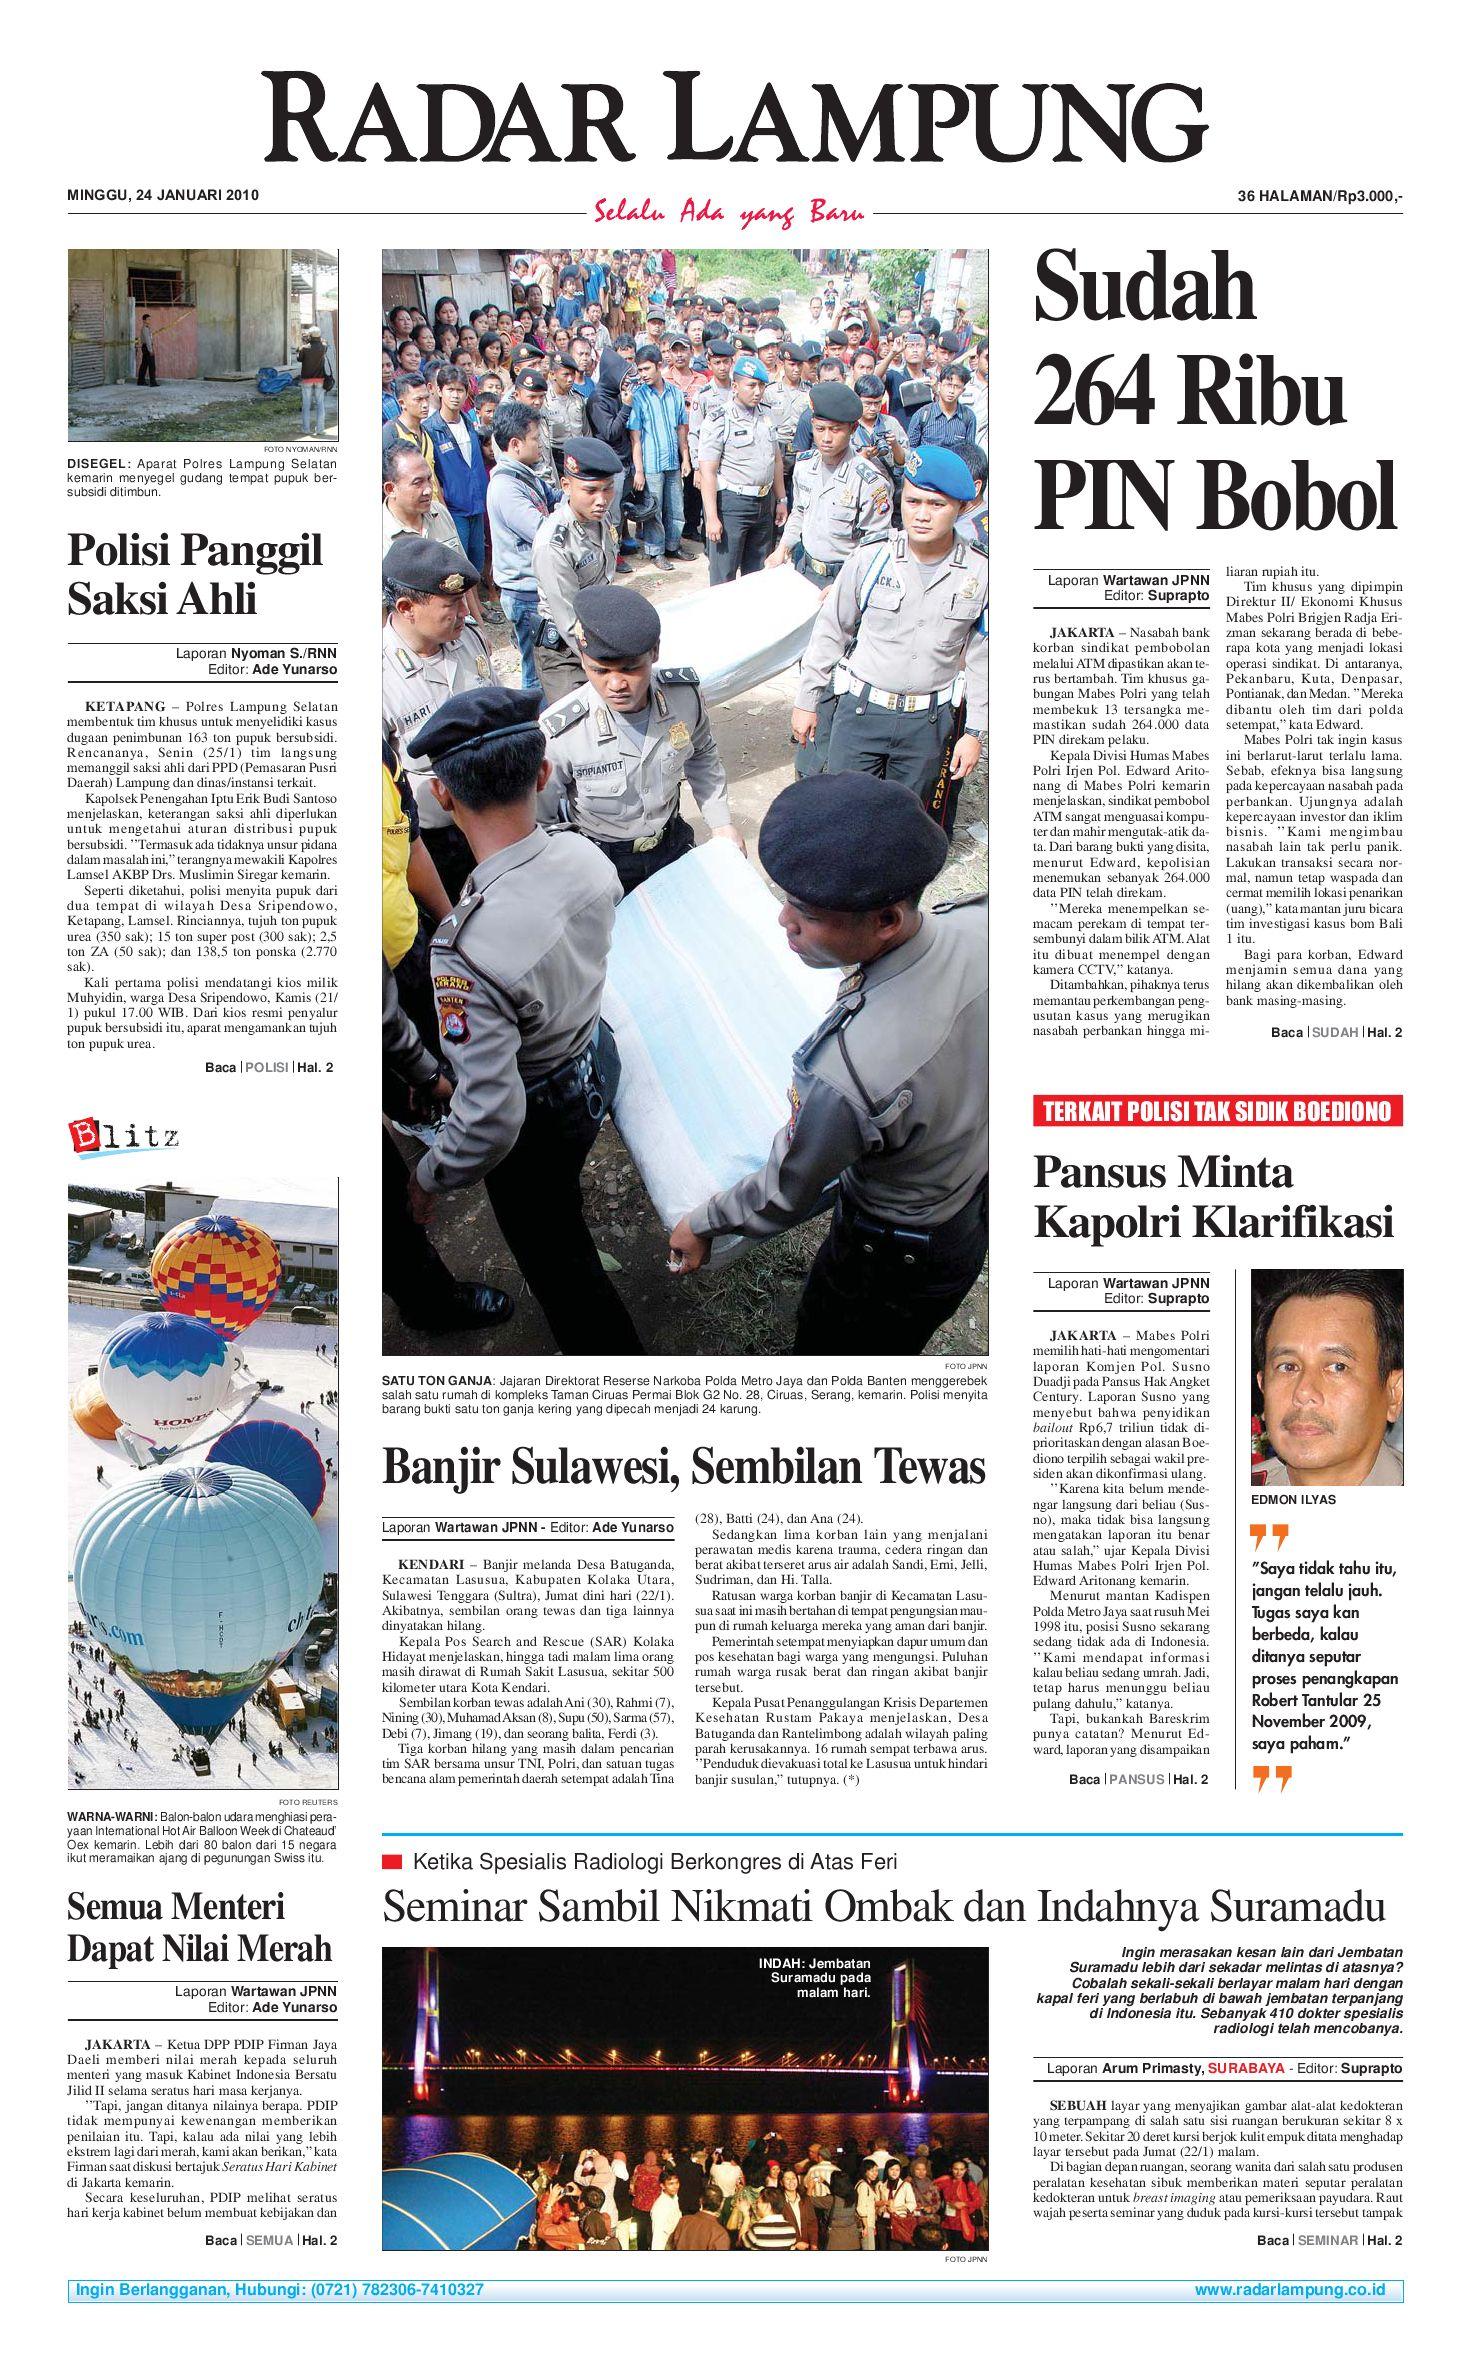 Radar Lampung Minggu 24 Januari 2010 By Issuu Parcel Makanan Ampamp Keramik Pja 1608